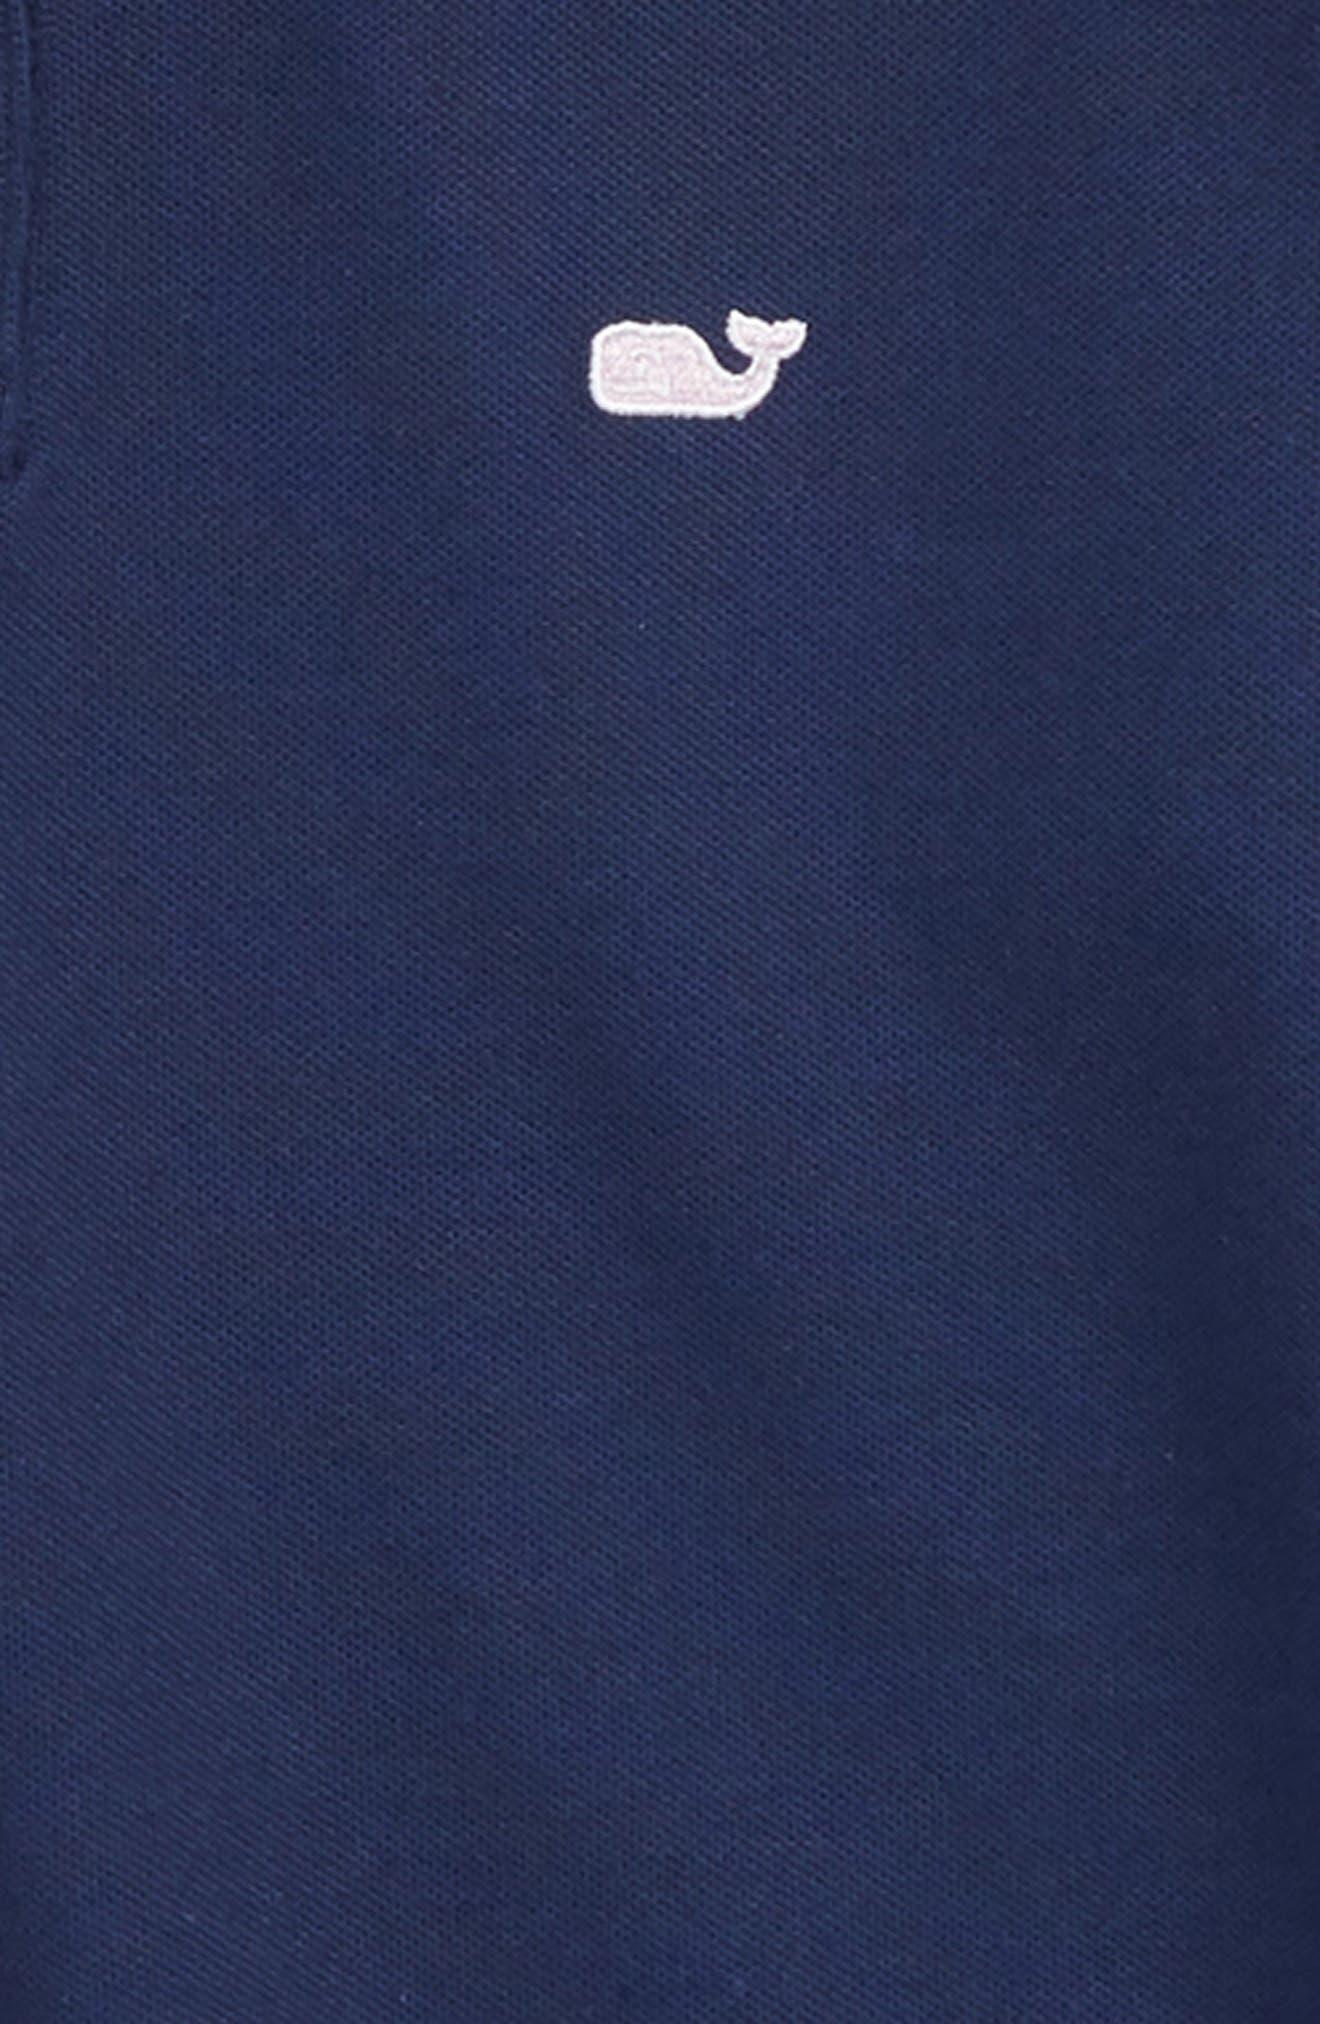 Long Sleeve Pique Polo,                             Alternate thumbnail 2, color,                             400